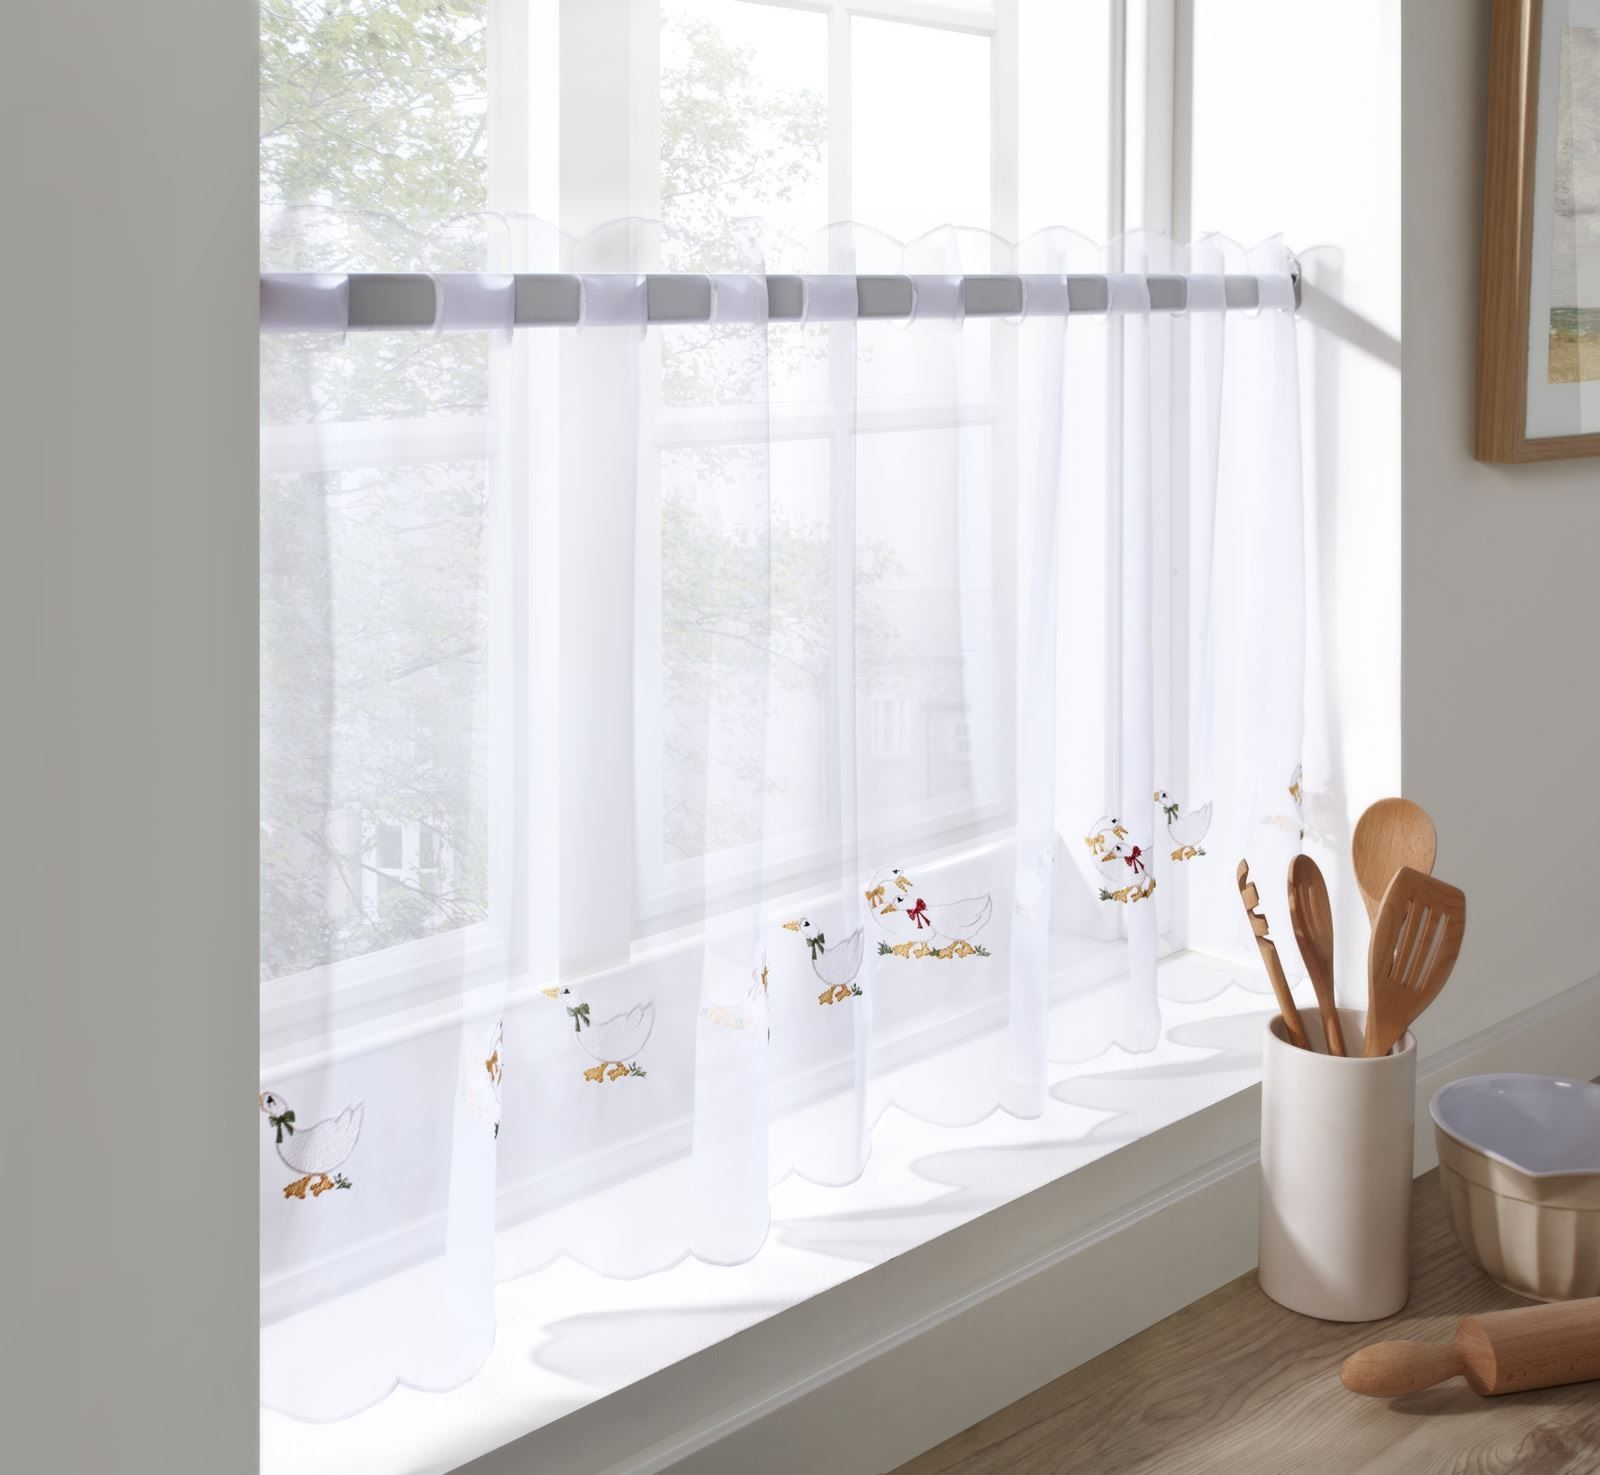 Net curtains bathroom windows realtagfo pinterest